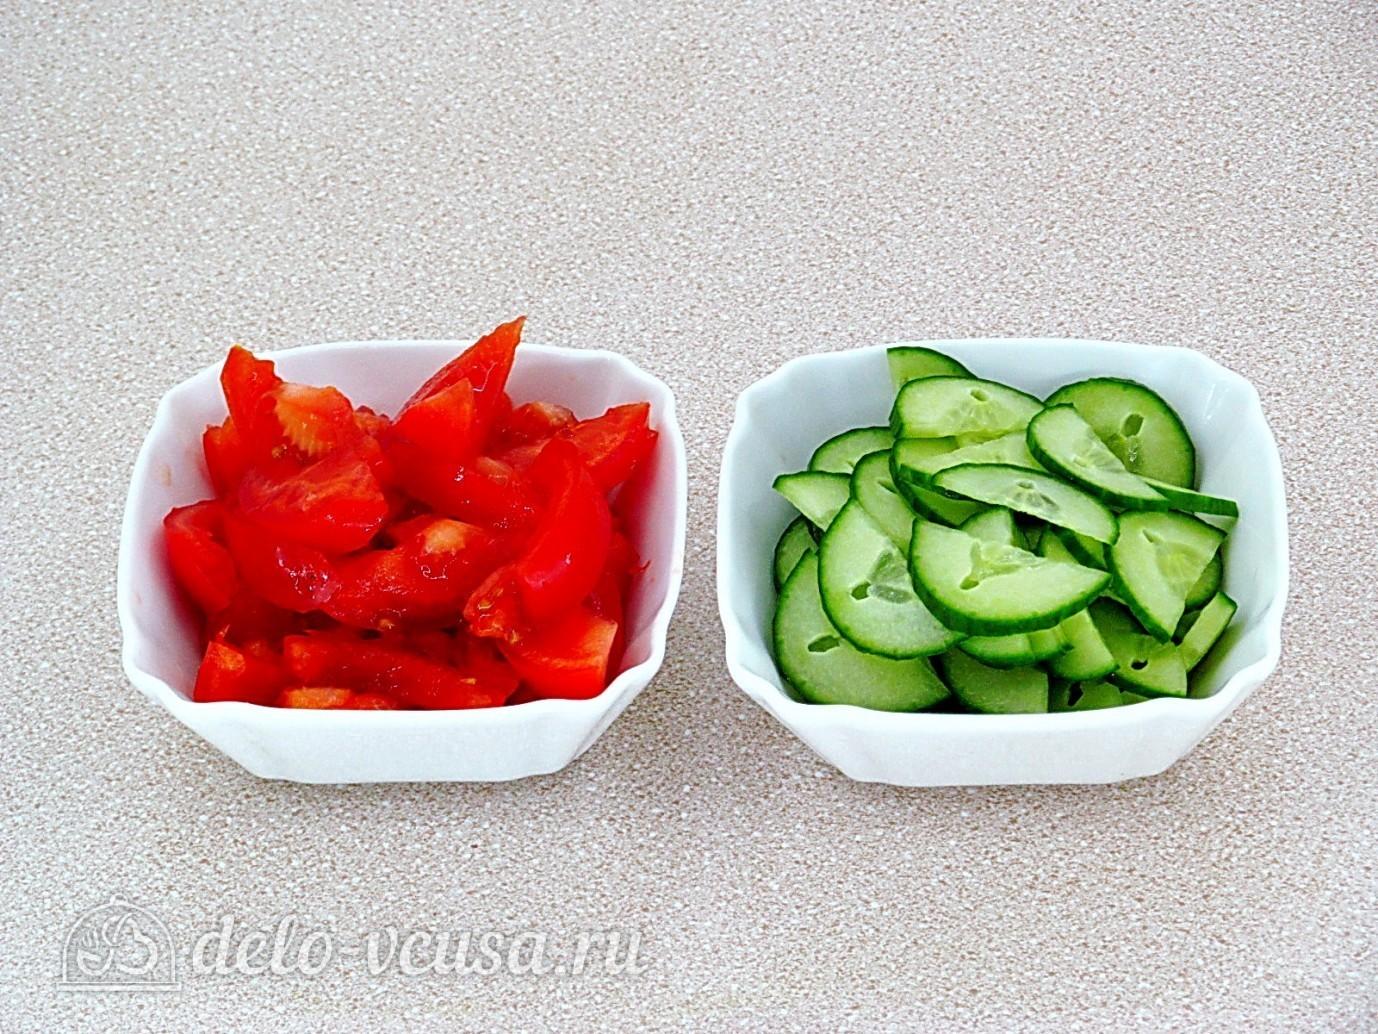 Салат Хориатики с брынзой: Нарежьте огурец и помидор